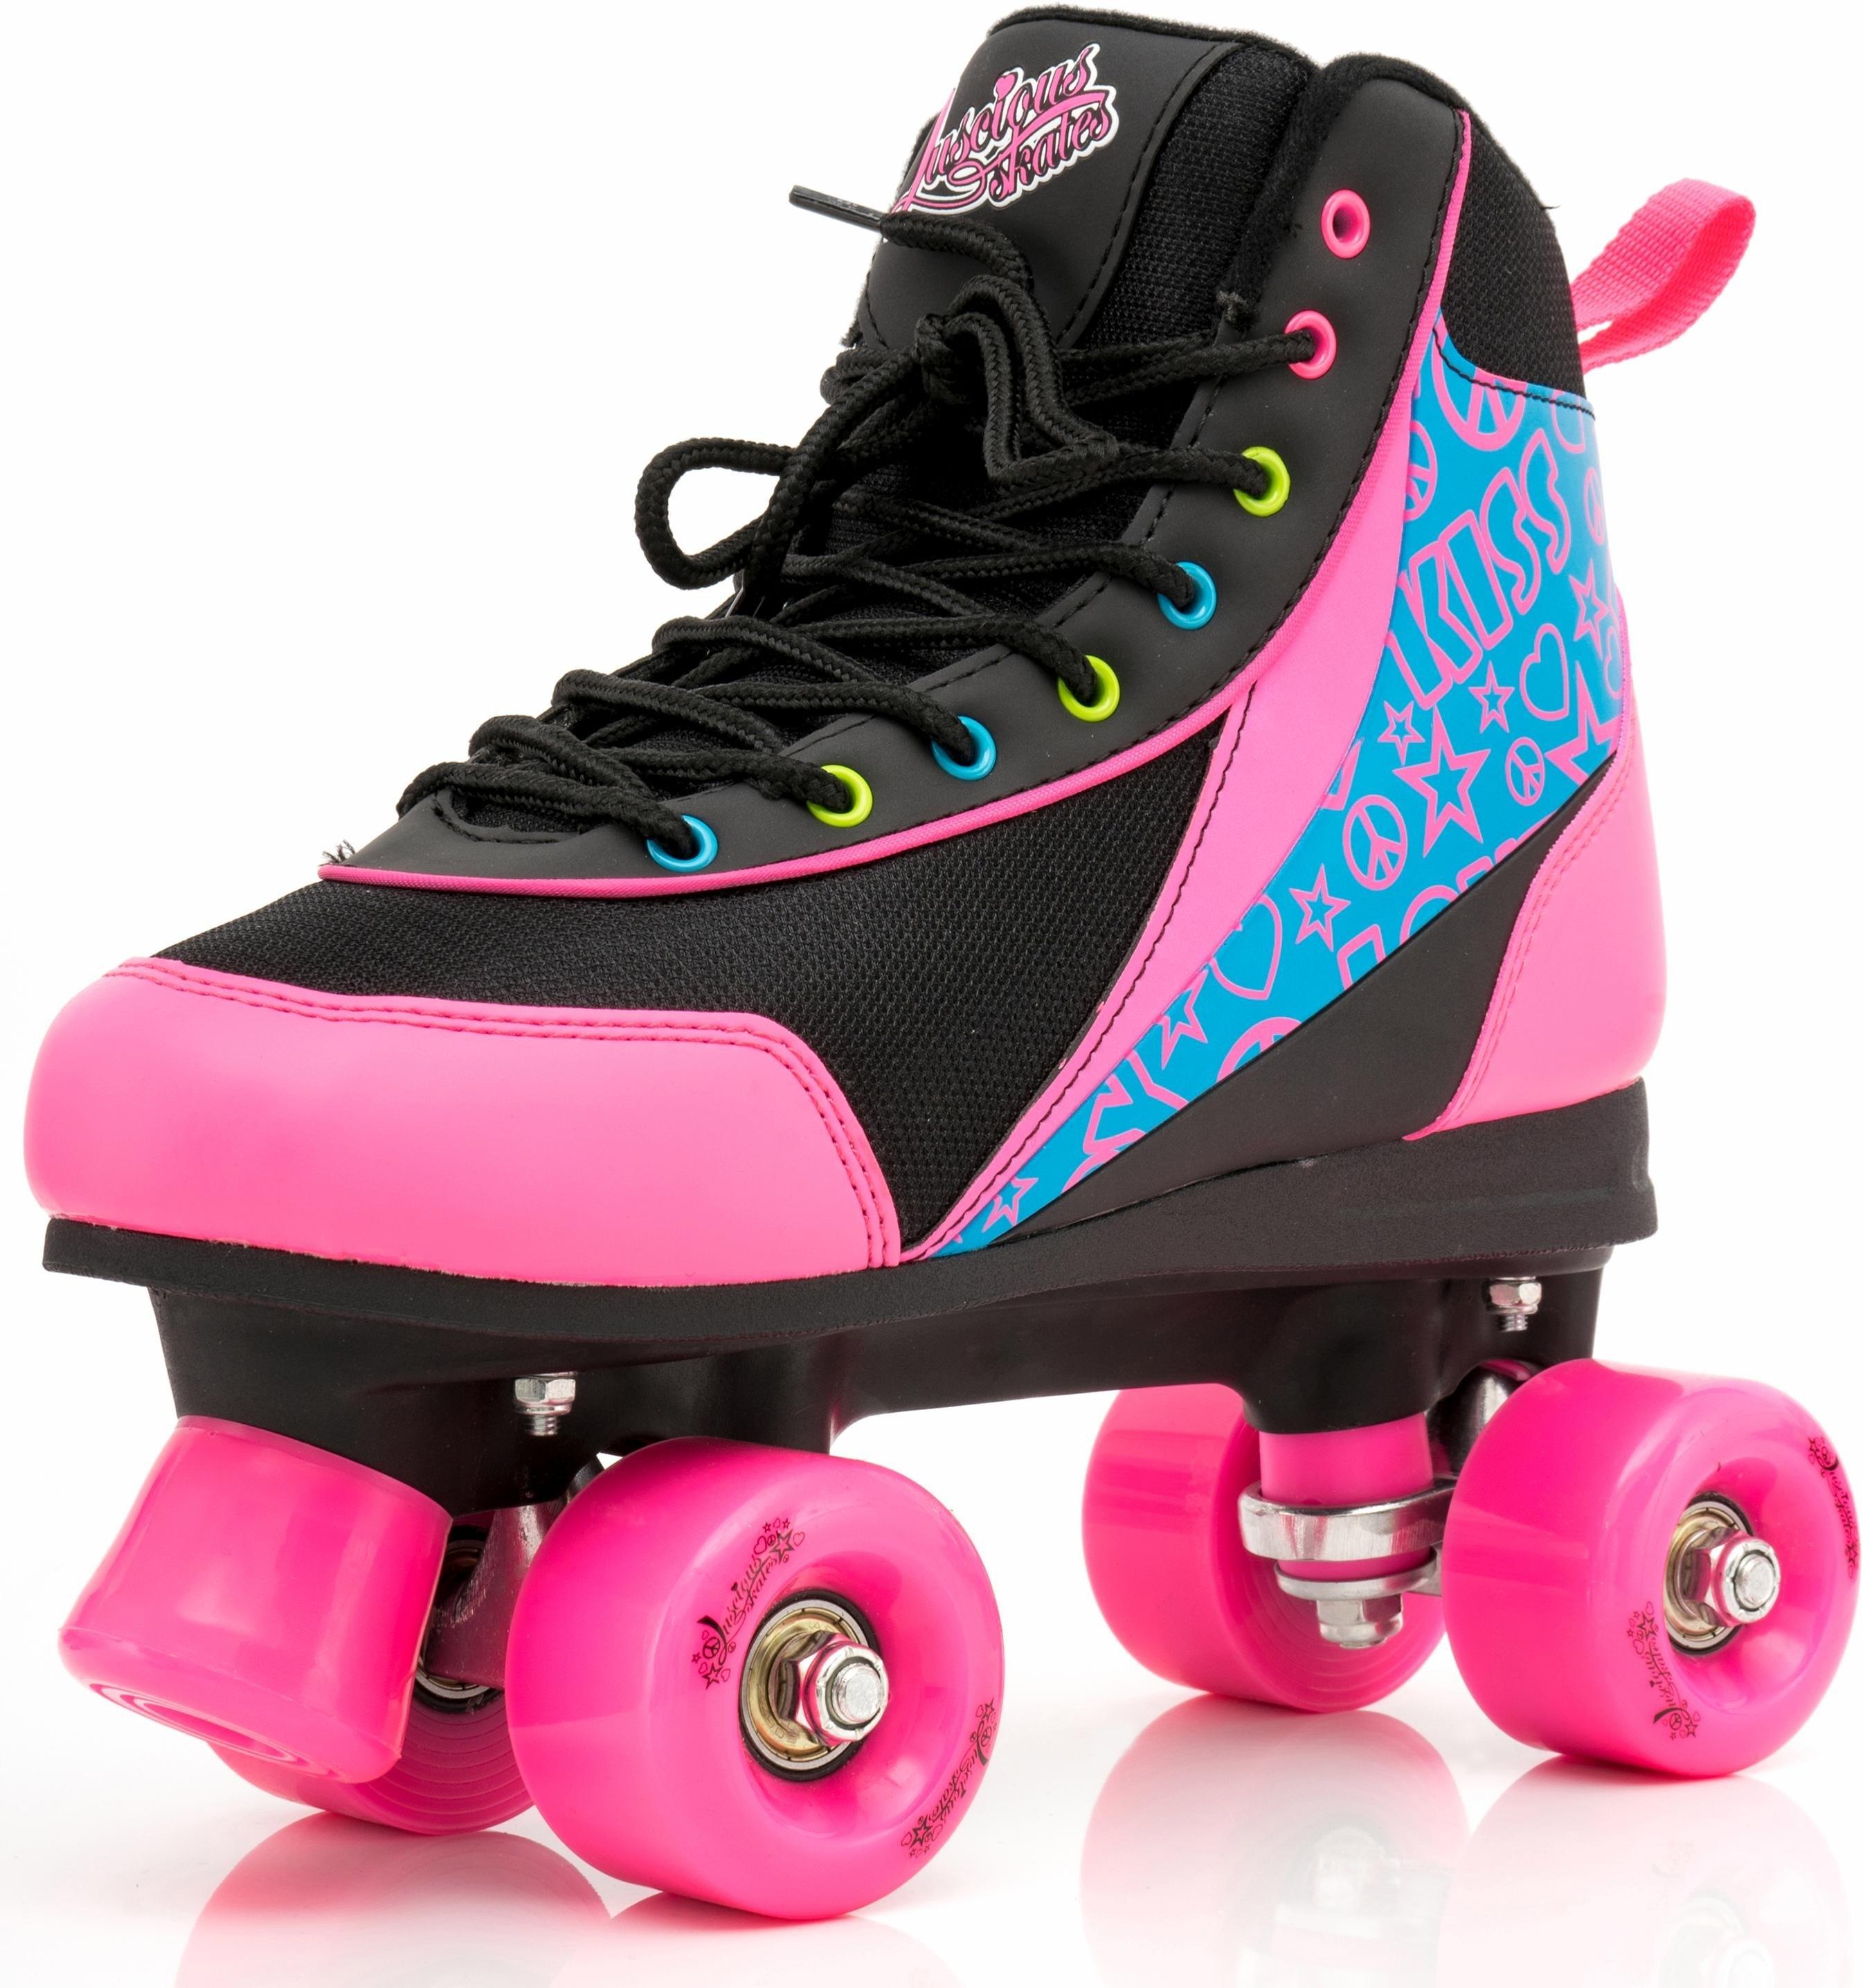 Luscious Skates skateschoenen »Disco Diva« voordelig en veilig online kopen